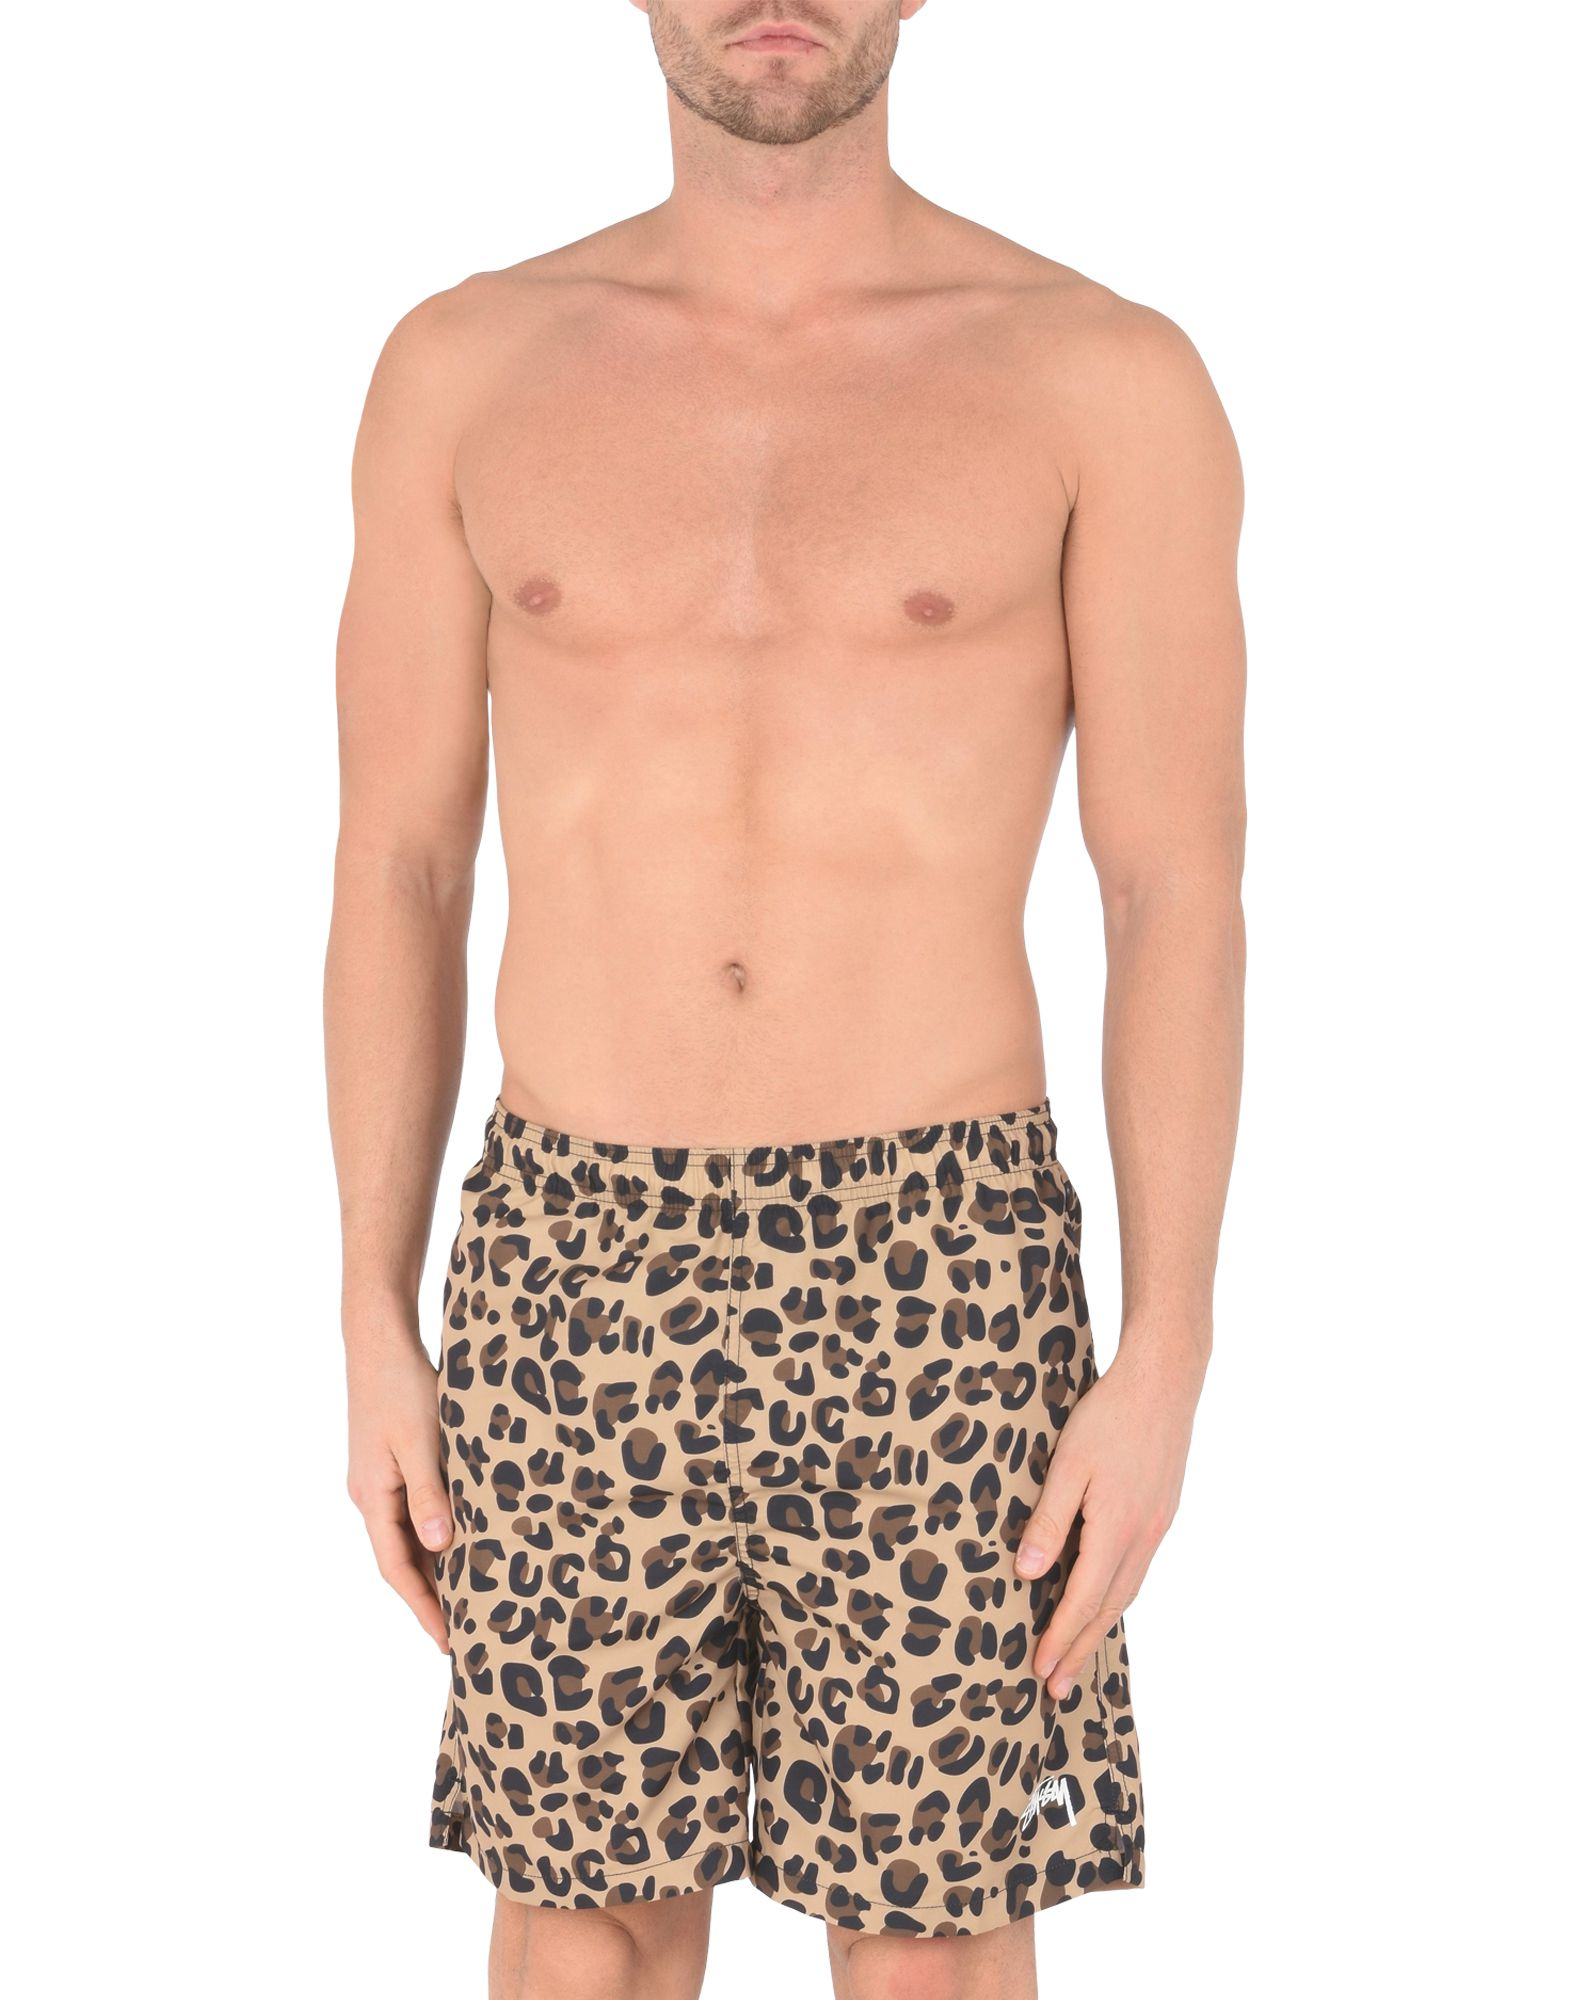 Boxer Mare Stussy Leopard - Water Short - Uomo - Leopard 47224519SK c4cf5c